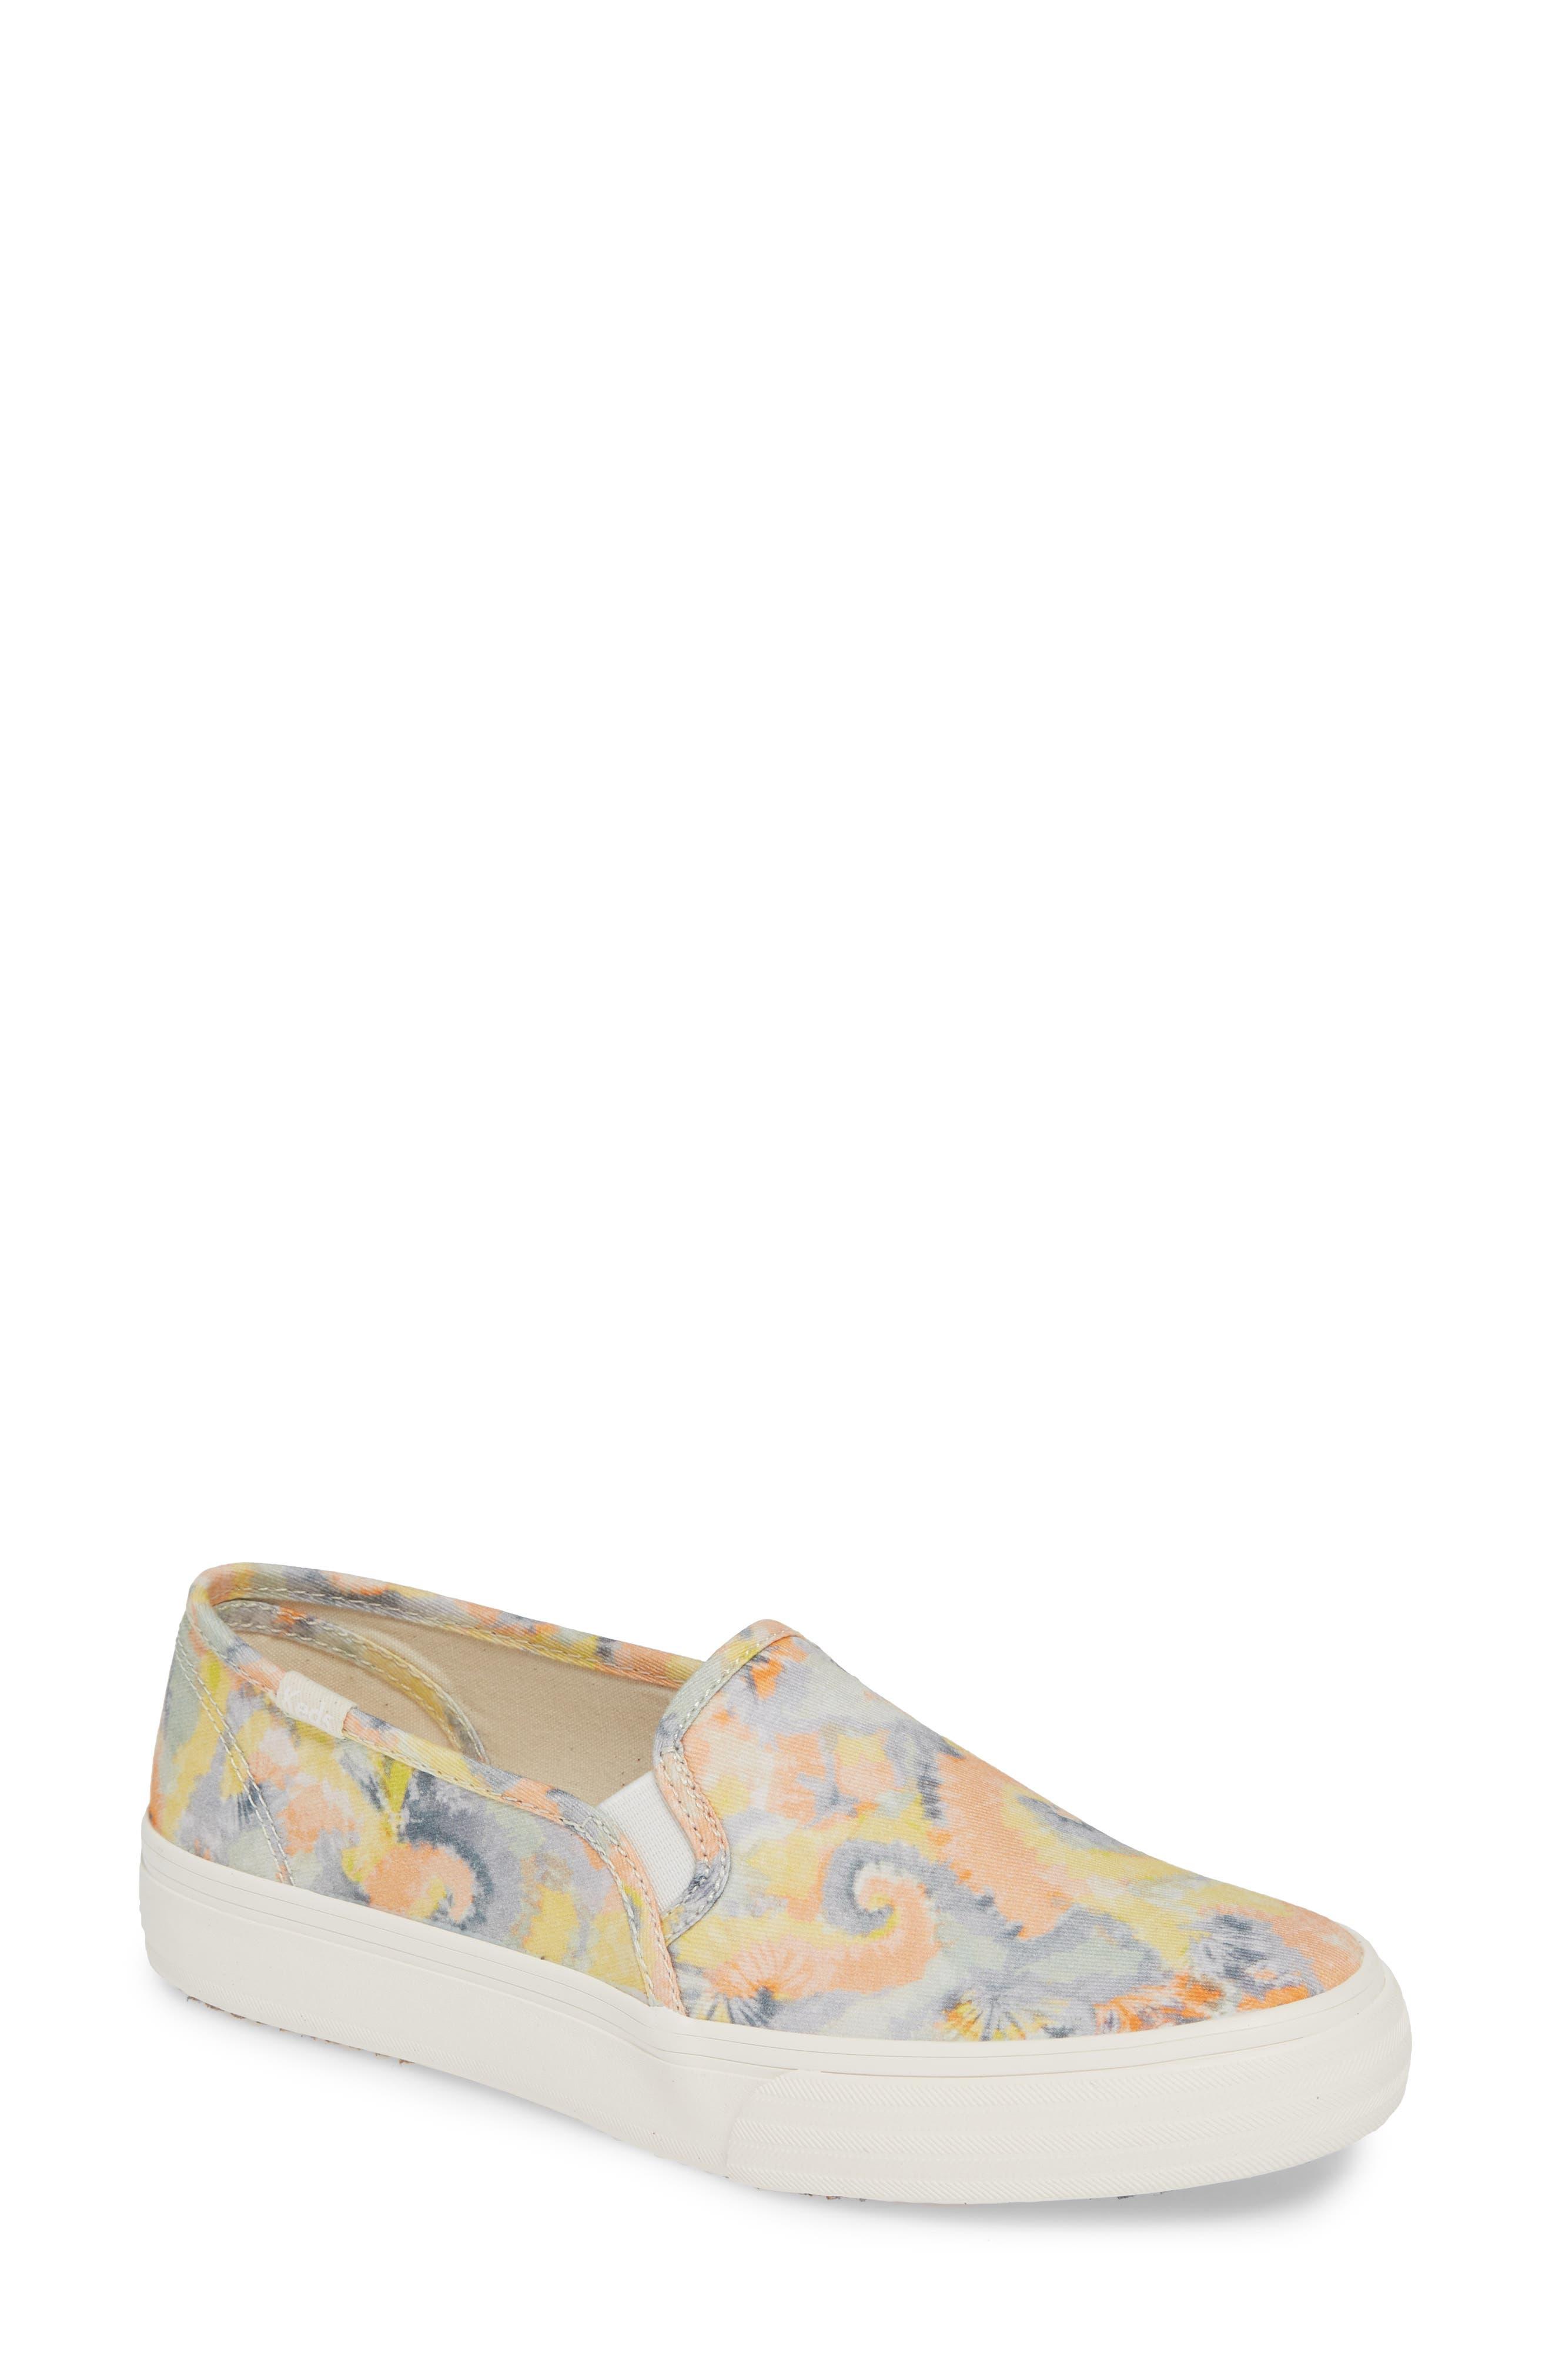 KEDS<SUP>®</SUP> Double Decker Tie Dye Sneaker, Main, color, PINK MULTI